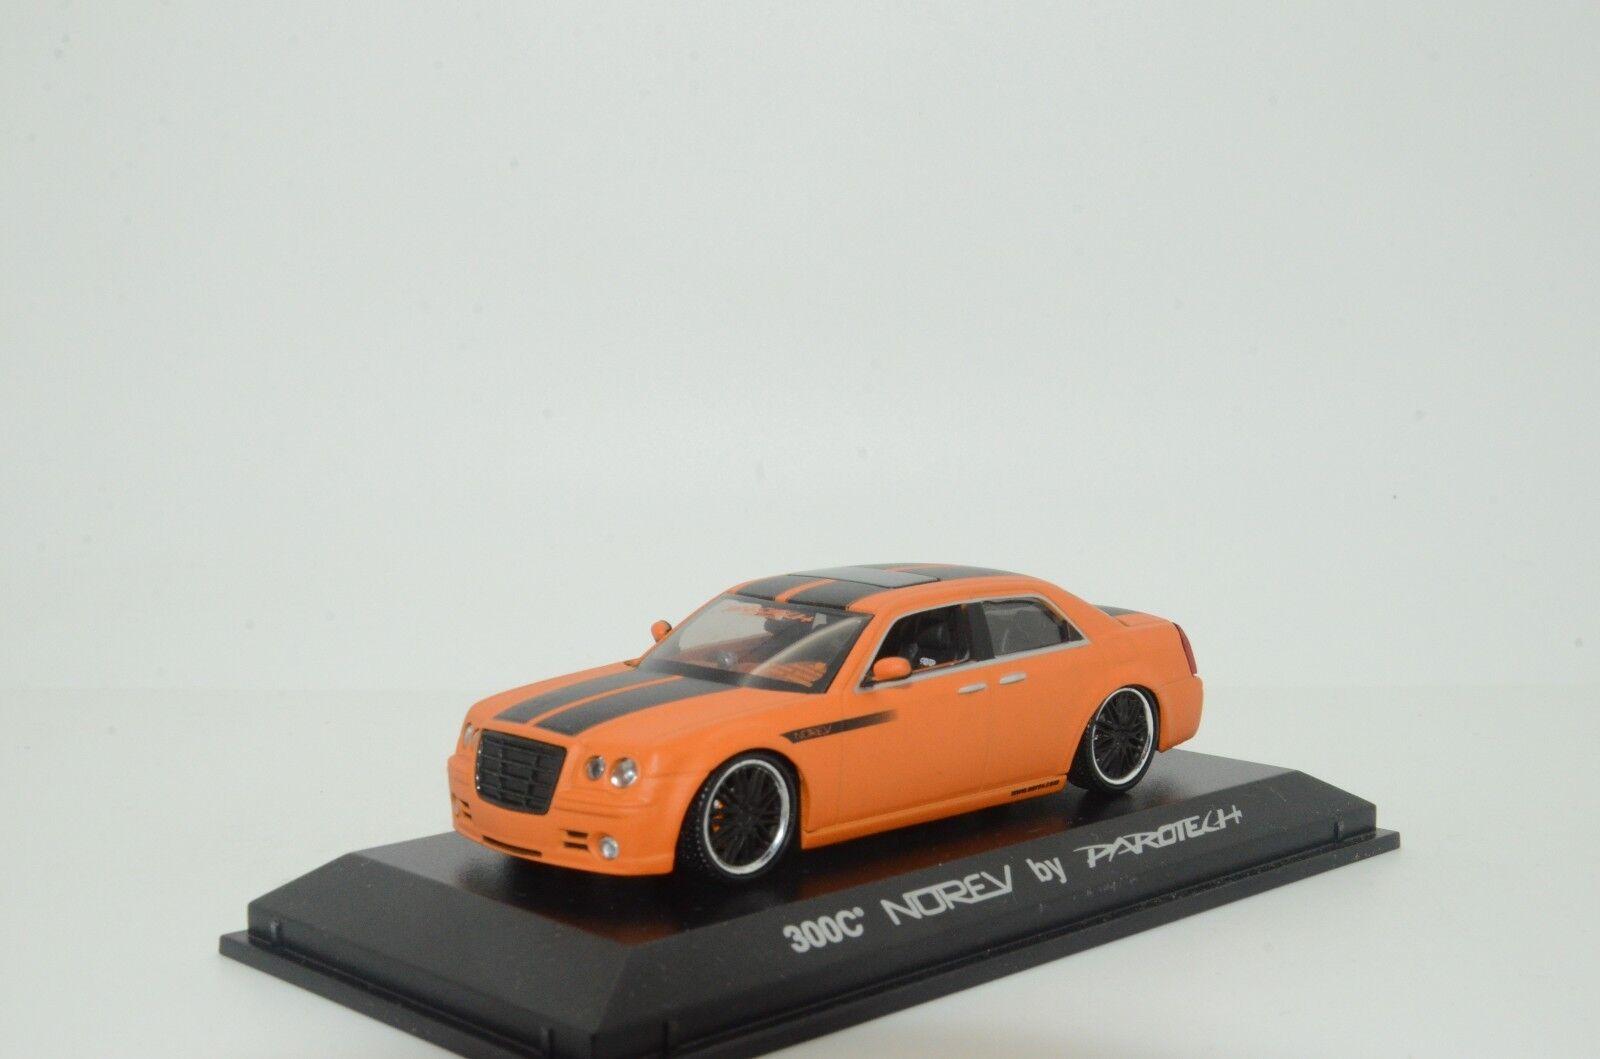 edición limitada en caliente    rara      Chrysler C300 Parojoech Norev 1 43  mejor servicio